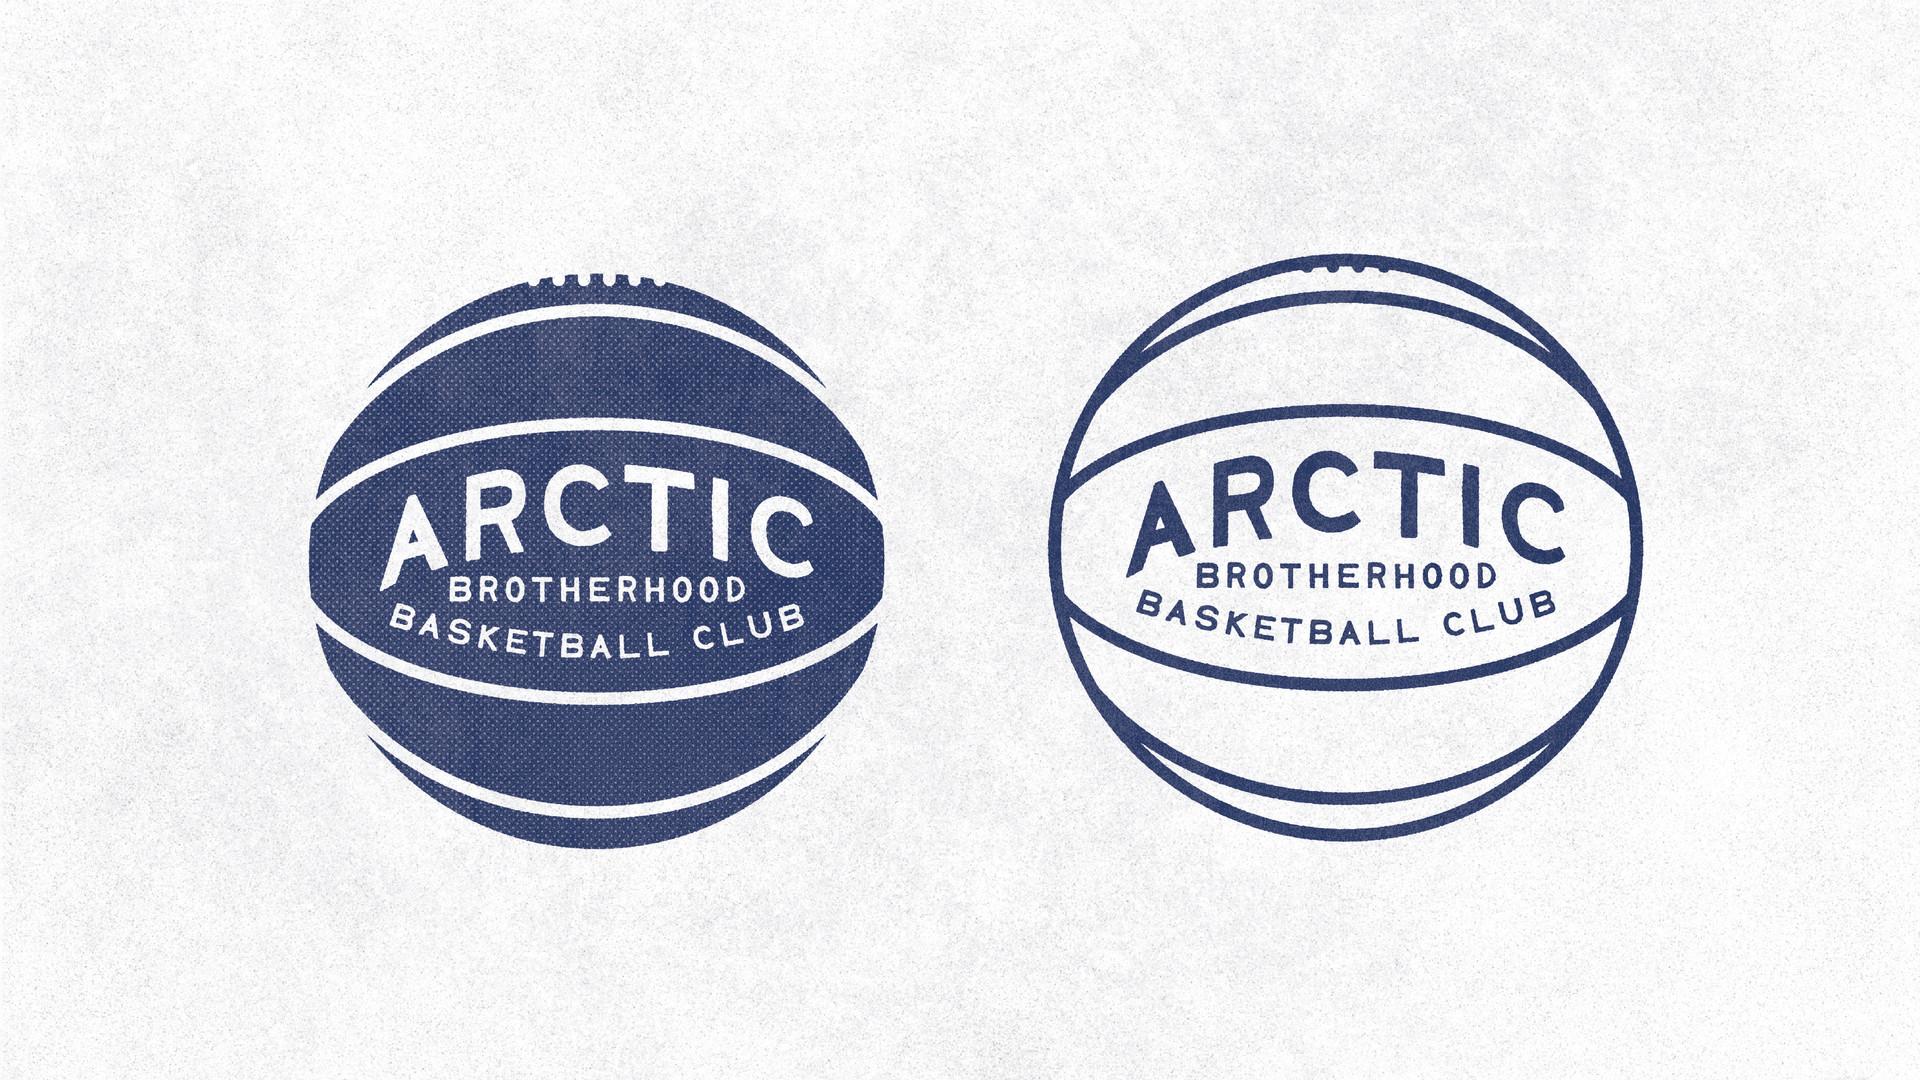 Arctic Brotherhood Concept-03.jpg